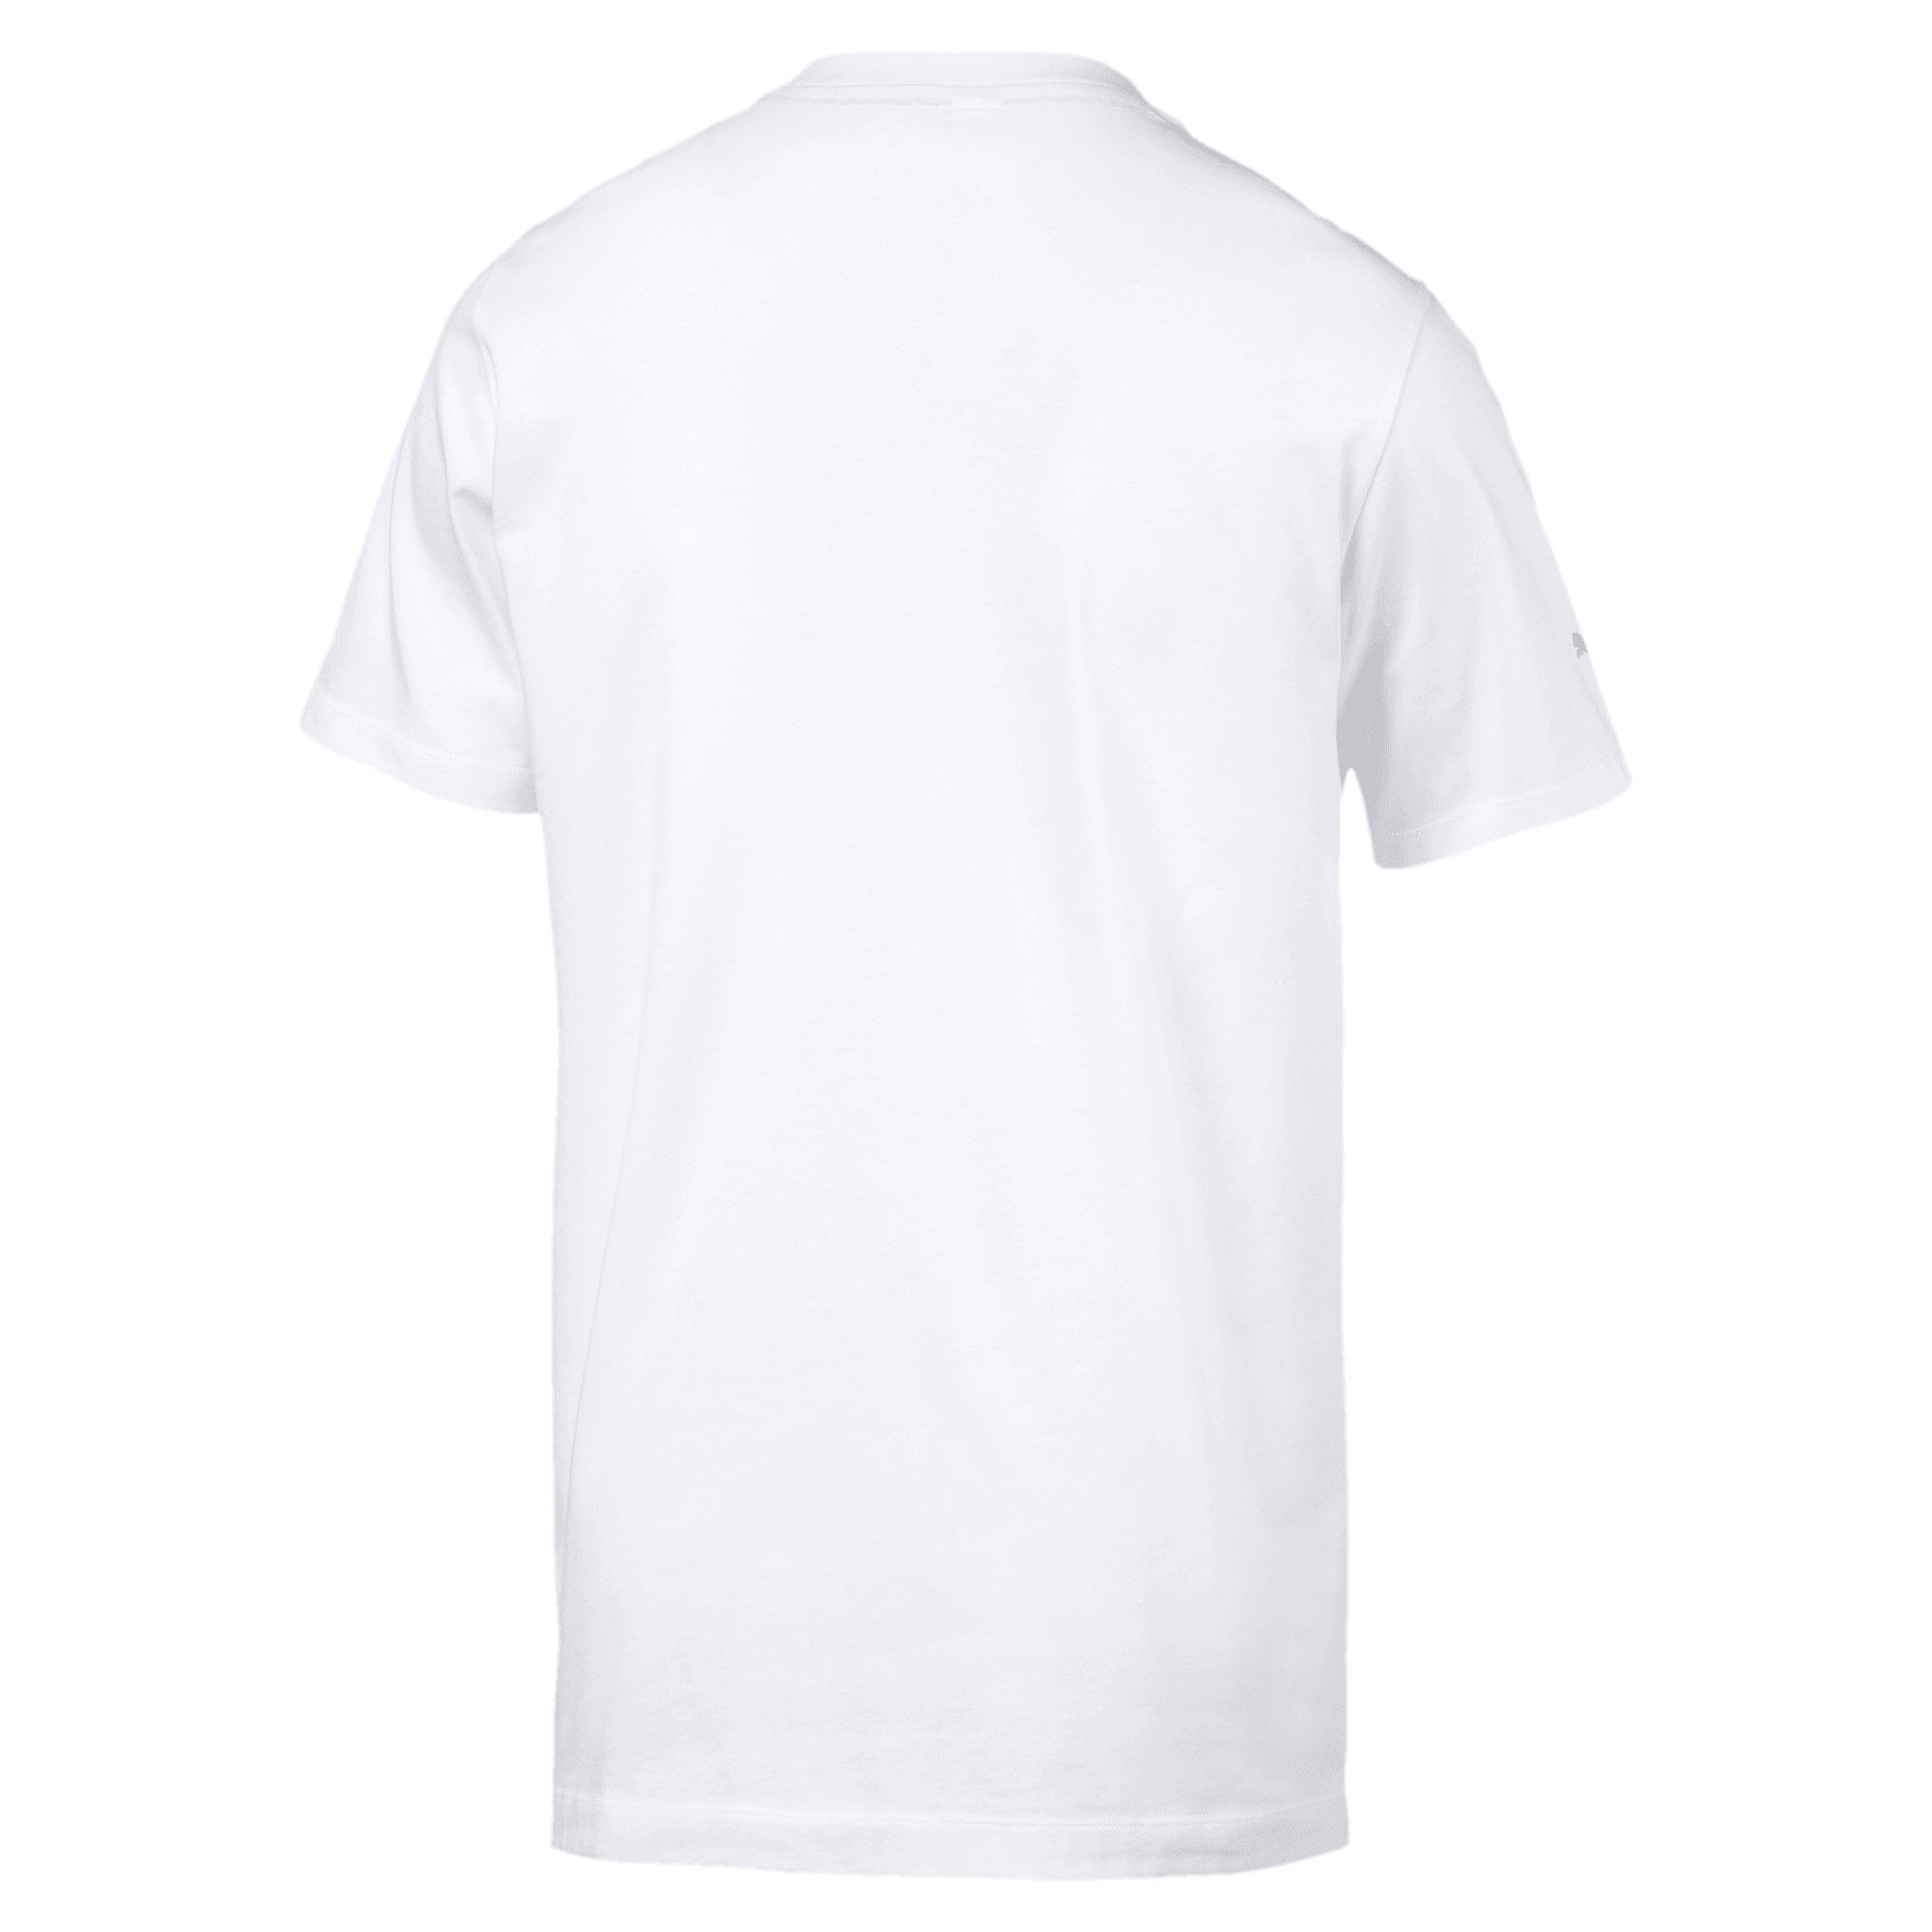 Thumbnail 4 of BMW Motorsport Life T-shirt voor heren, Puma White, medium